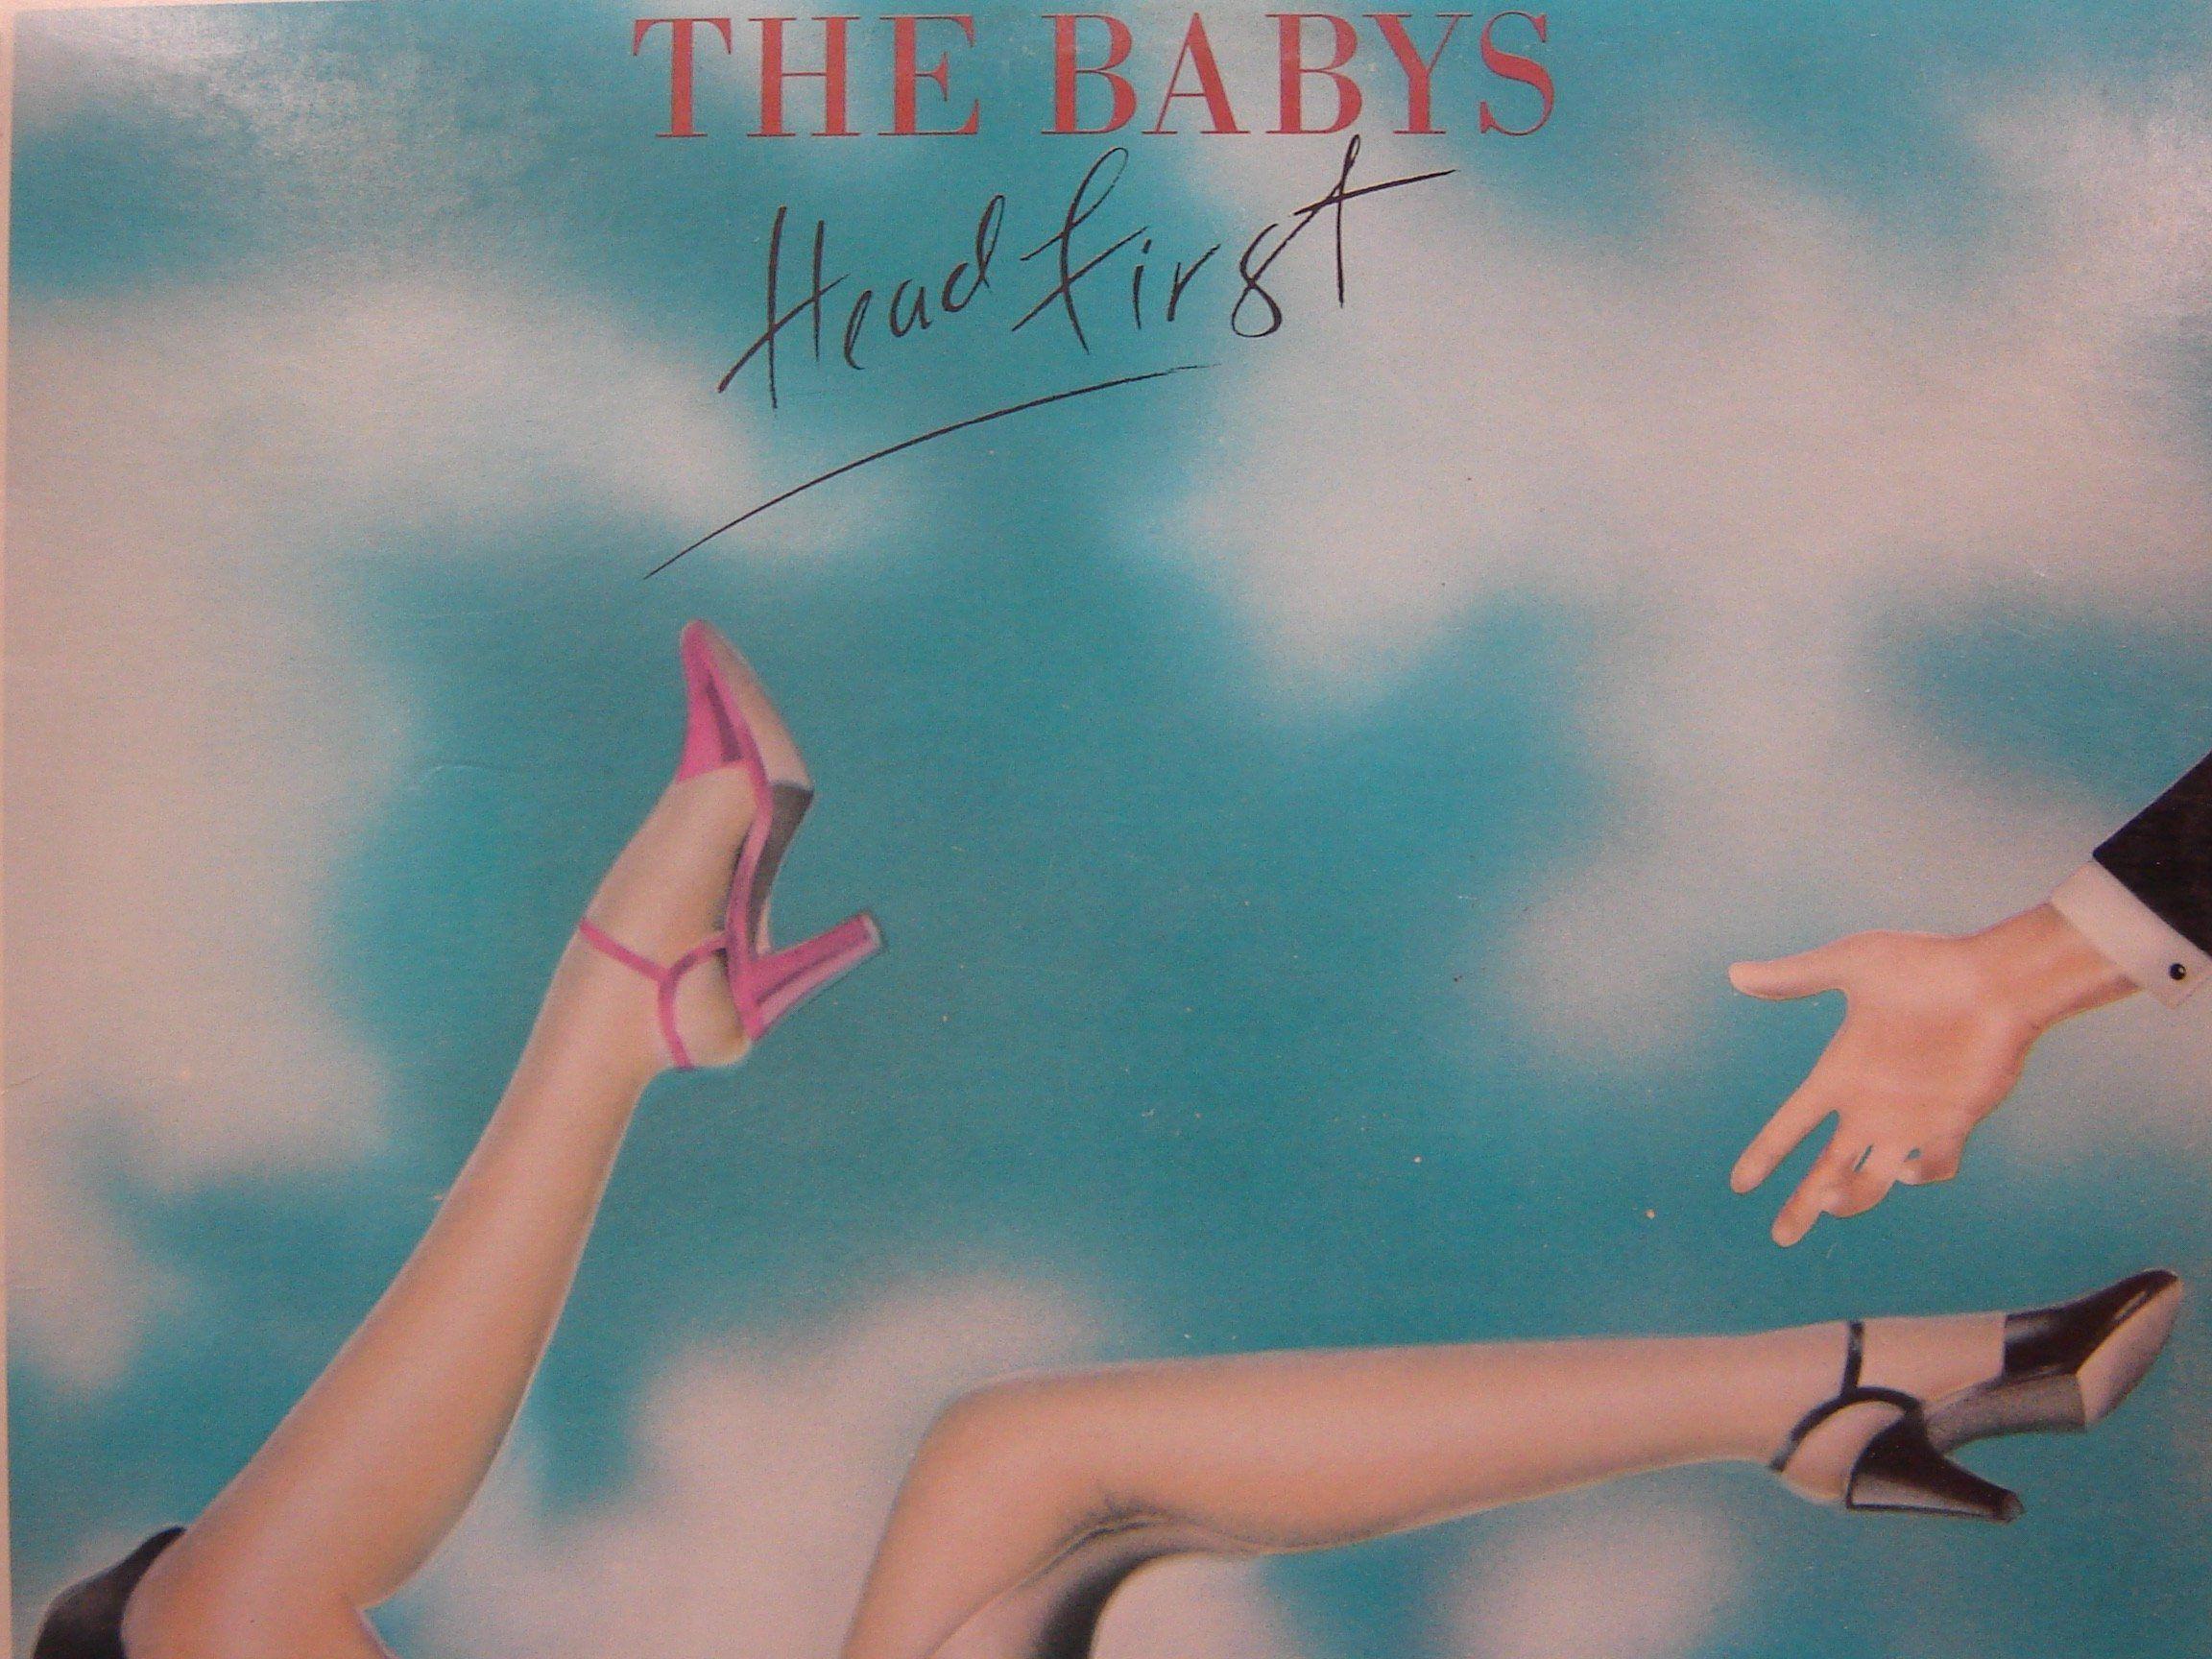 The Babys Head First Lp Chrysalis 1979 Vintage Vinyl Lp